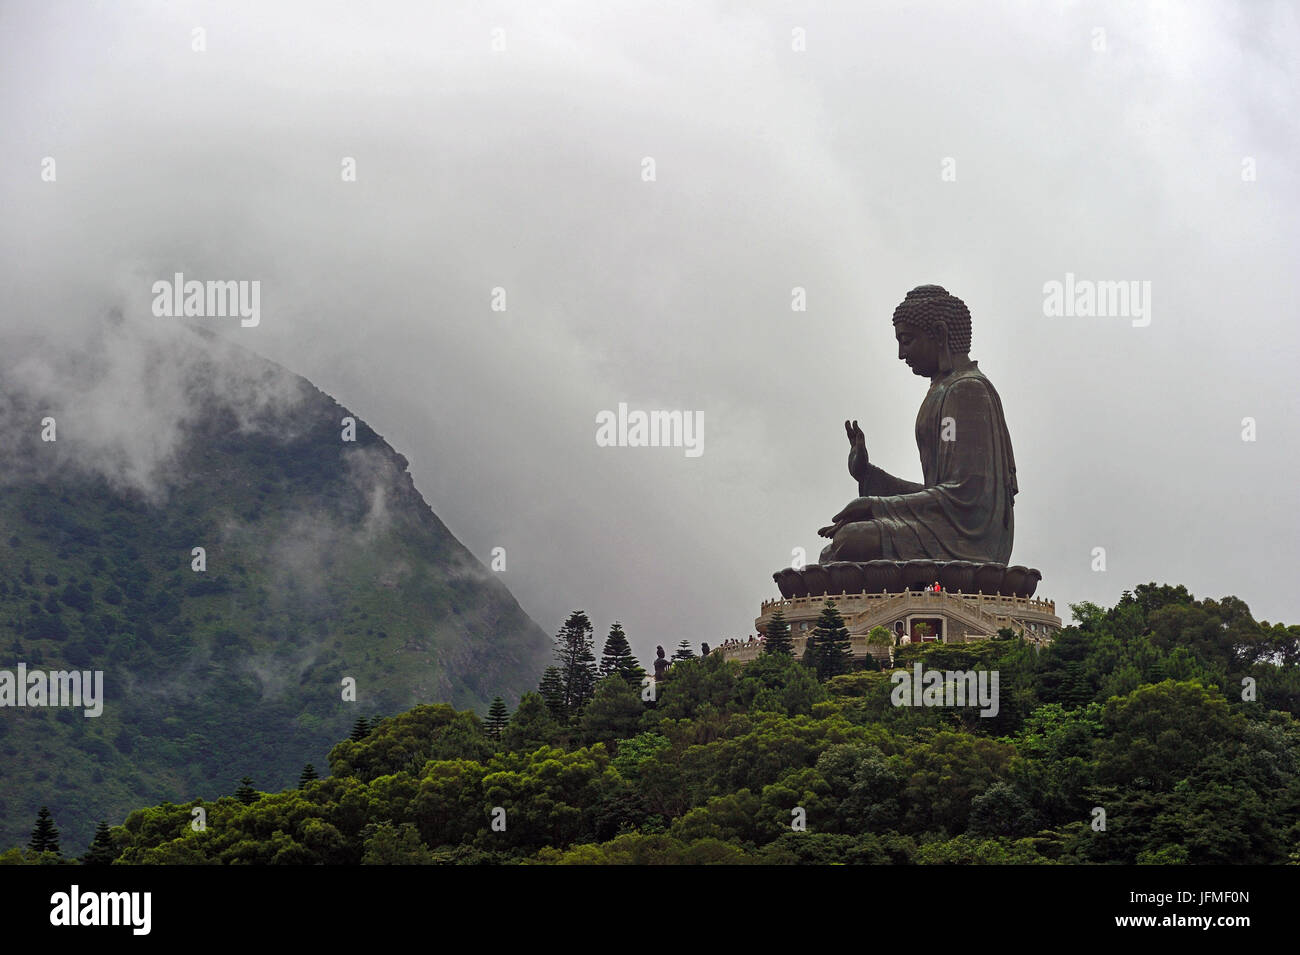 China, Hong Kong, Lantau Island, Ngong Ping,The Worlds Largest Outdoor Seated Bronze Buddha Statue at the Po Lin - Stock Image